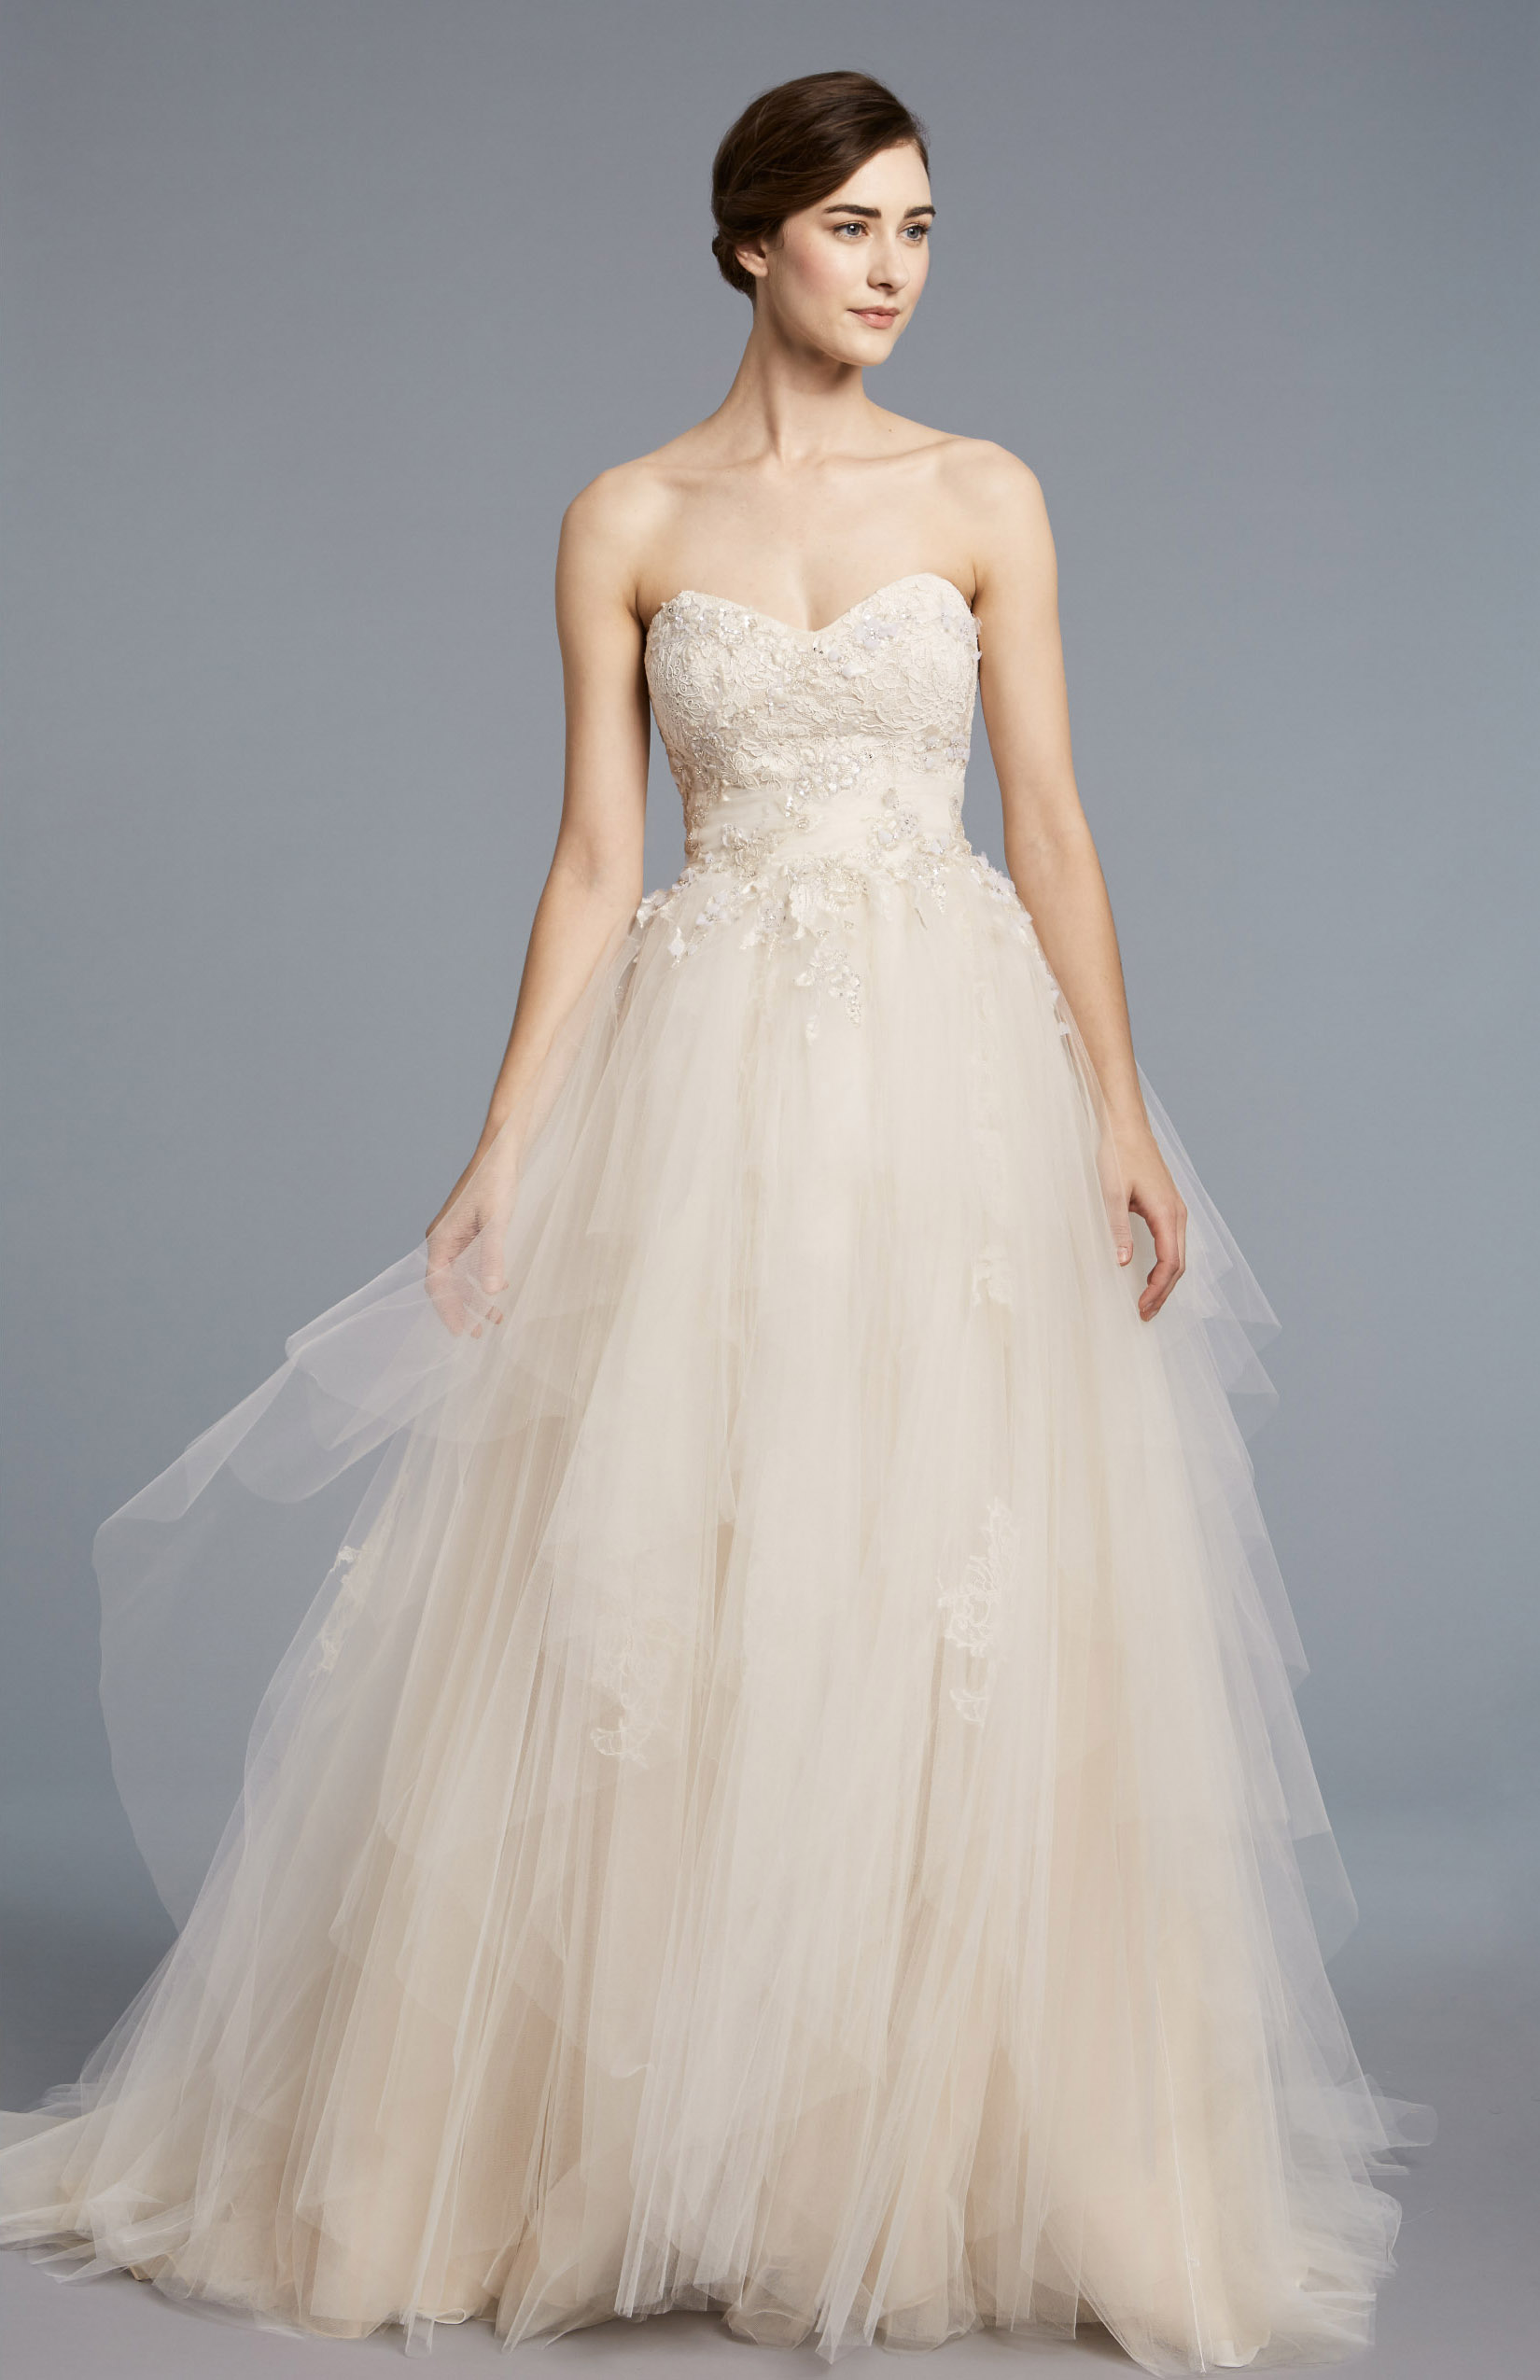 Wedding dresses manhasset bridesmaid dresses for Wedding dresses iowa city